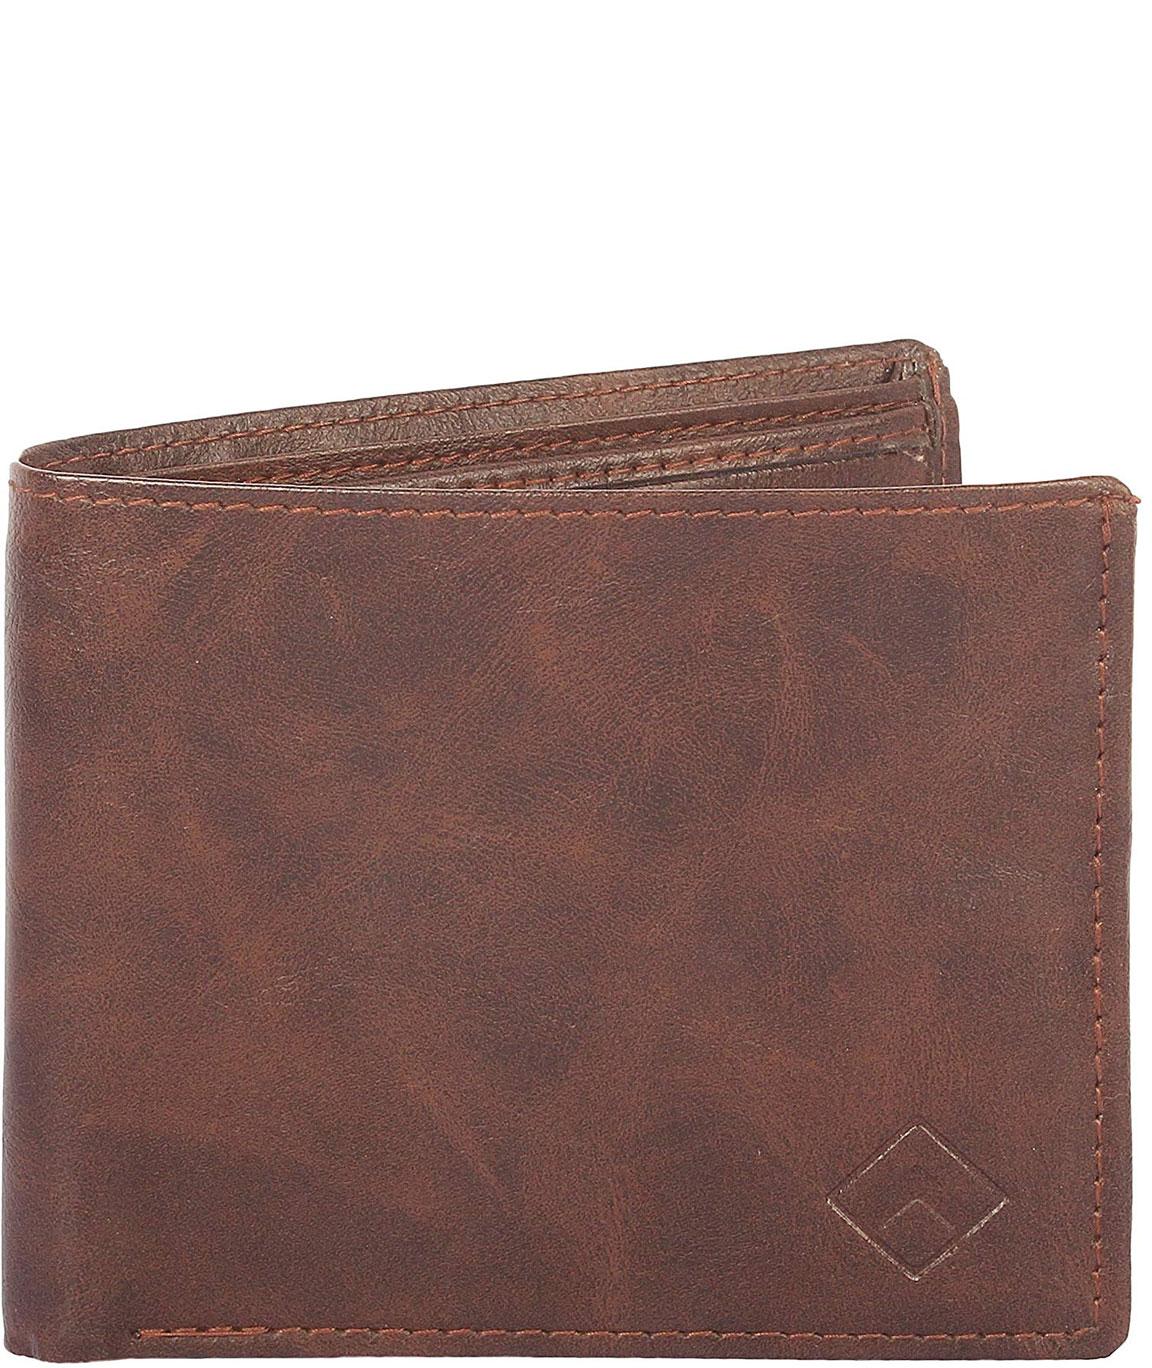 Urban alfami Synthetic Brown Men`s Wallet